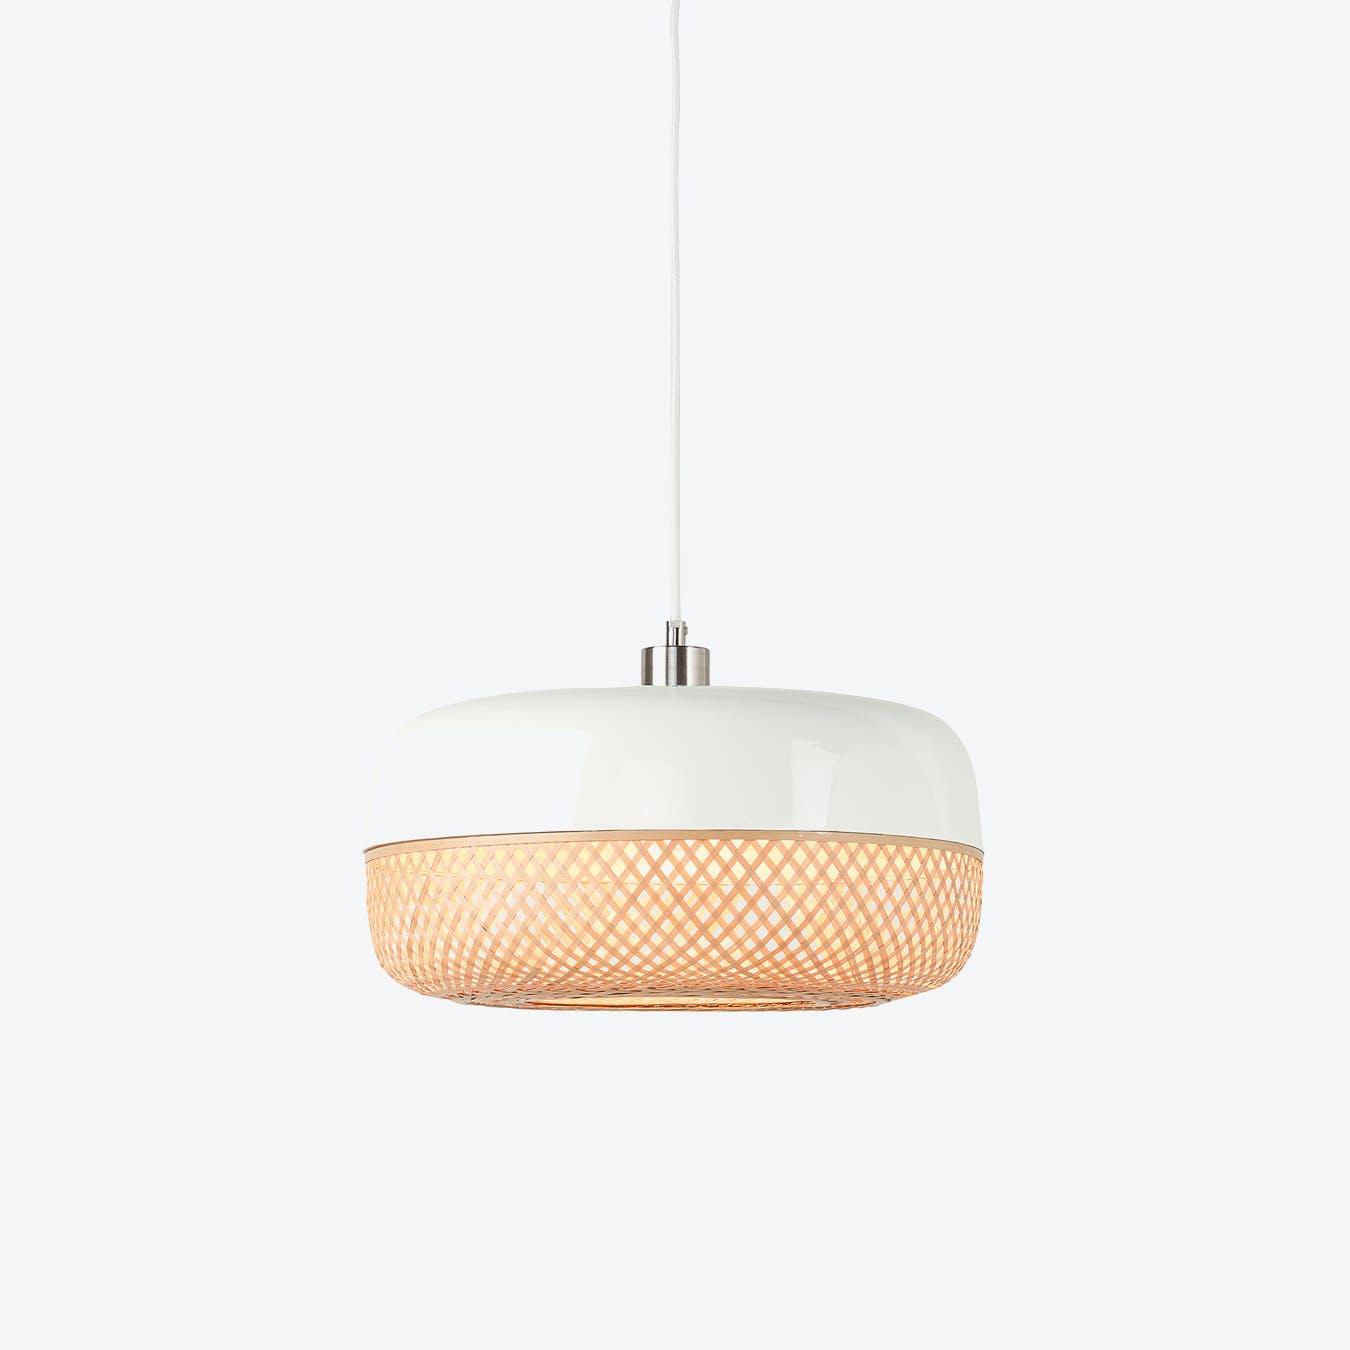 Mekong Single Pendant Lamp - Ø 40 x 22 cm